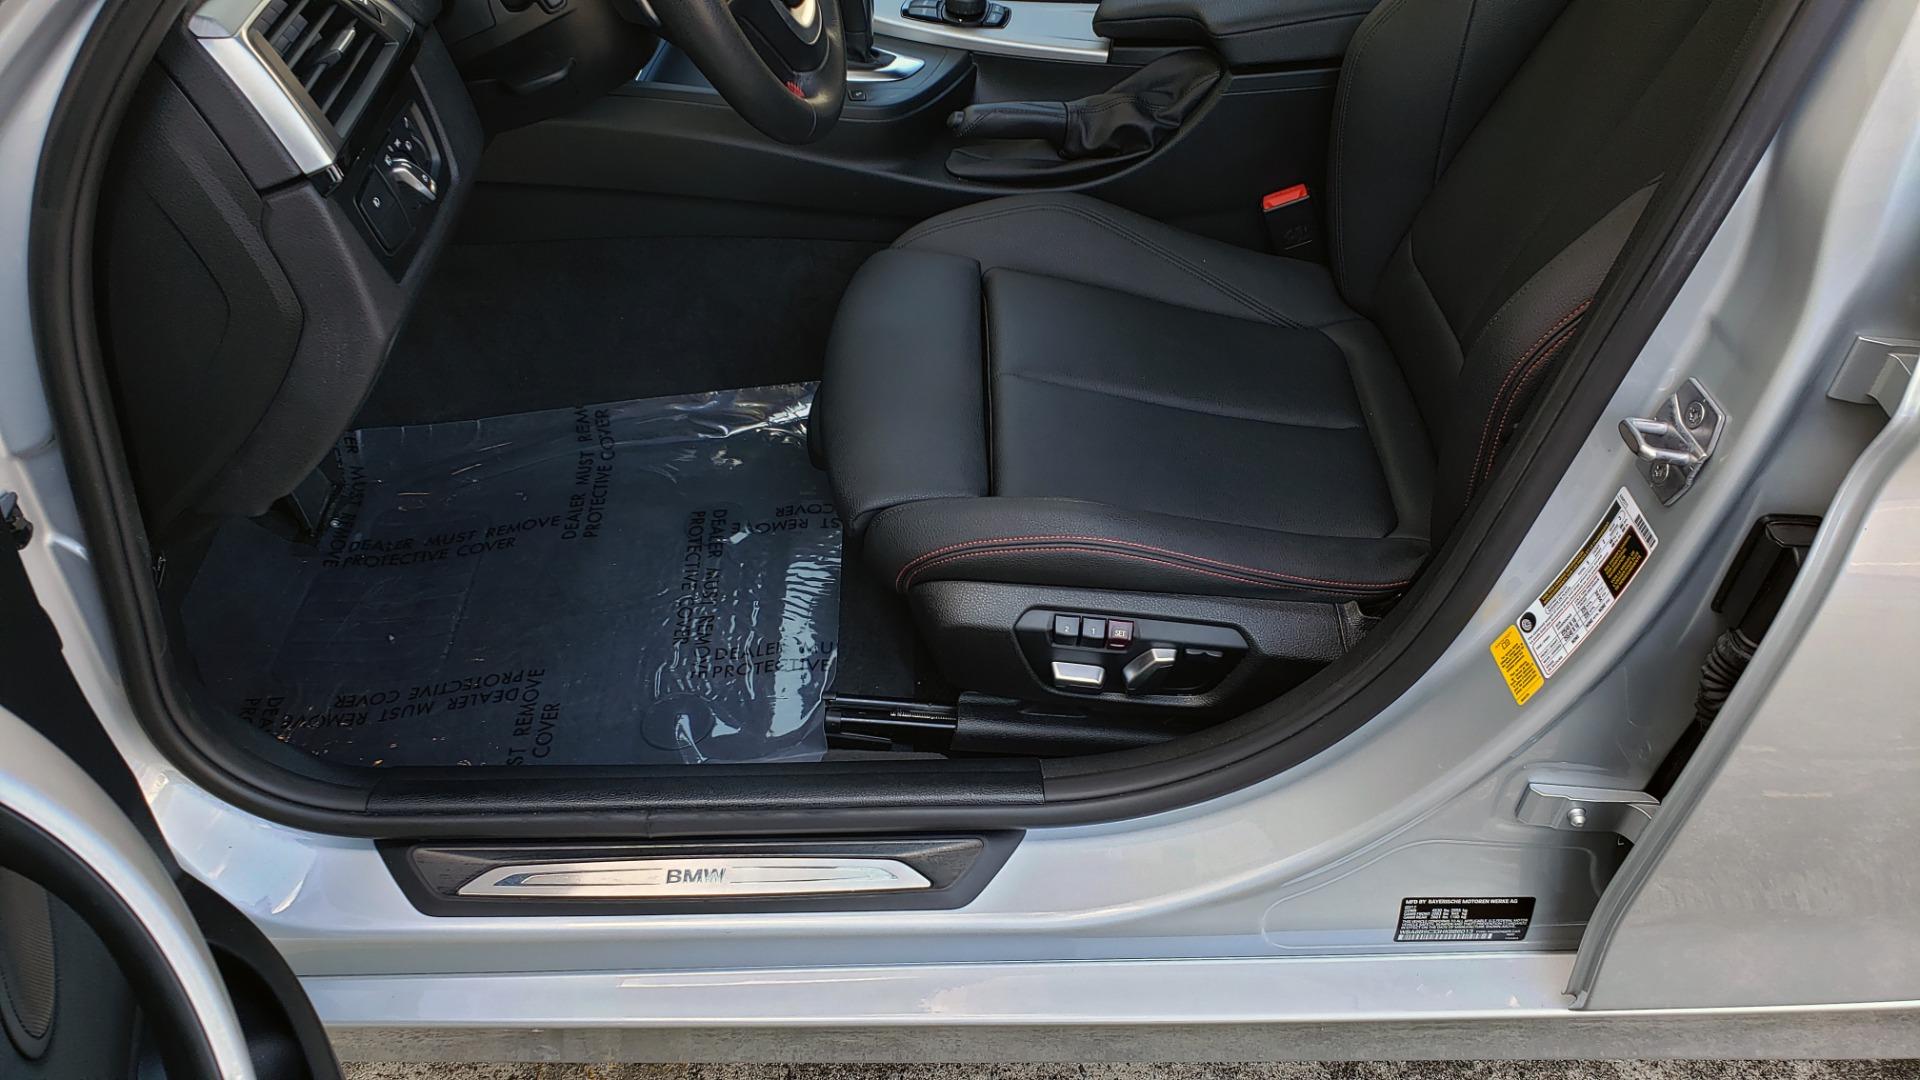 Used 2017 BMW 3 SERIES 330I SPORT SEDAN / DRVR ASST PKG / SUNROOF / REARVIEW for sale Sold at Formula Imports in Charlotte NC 28227 34